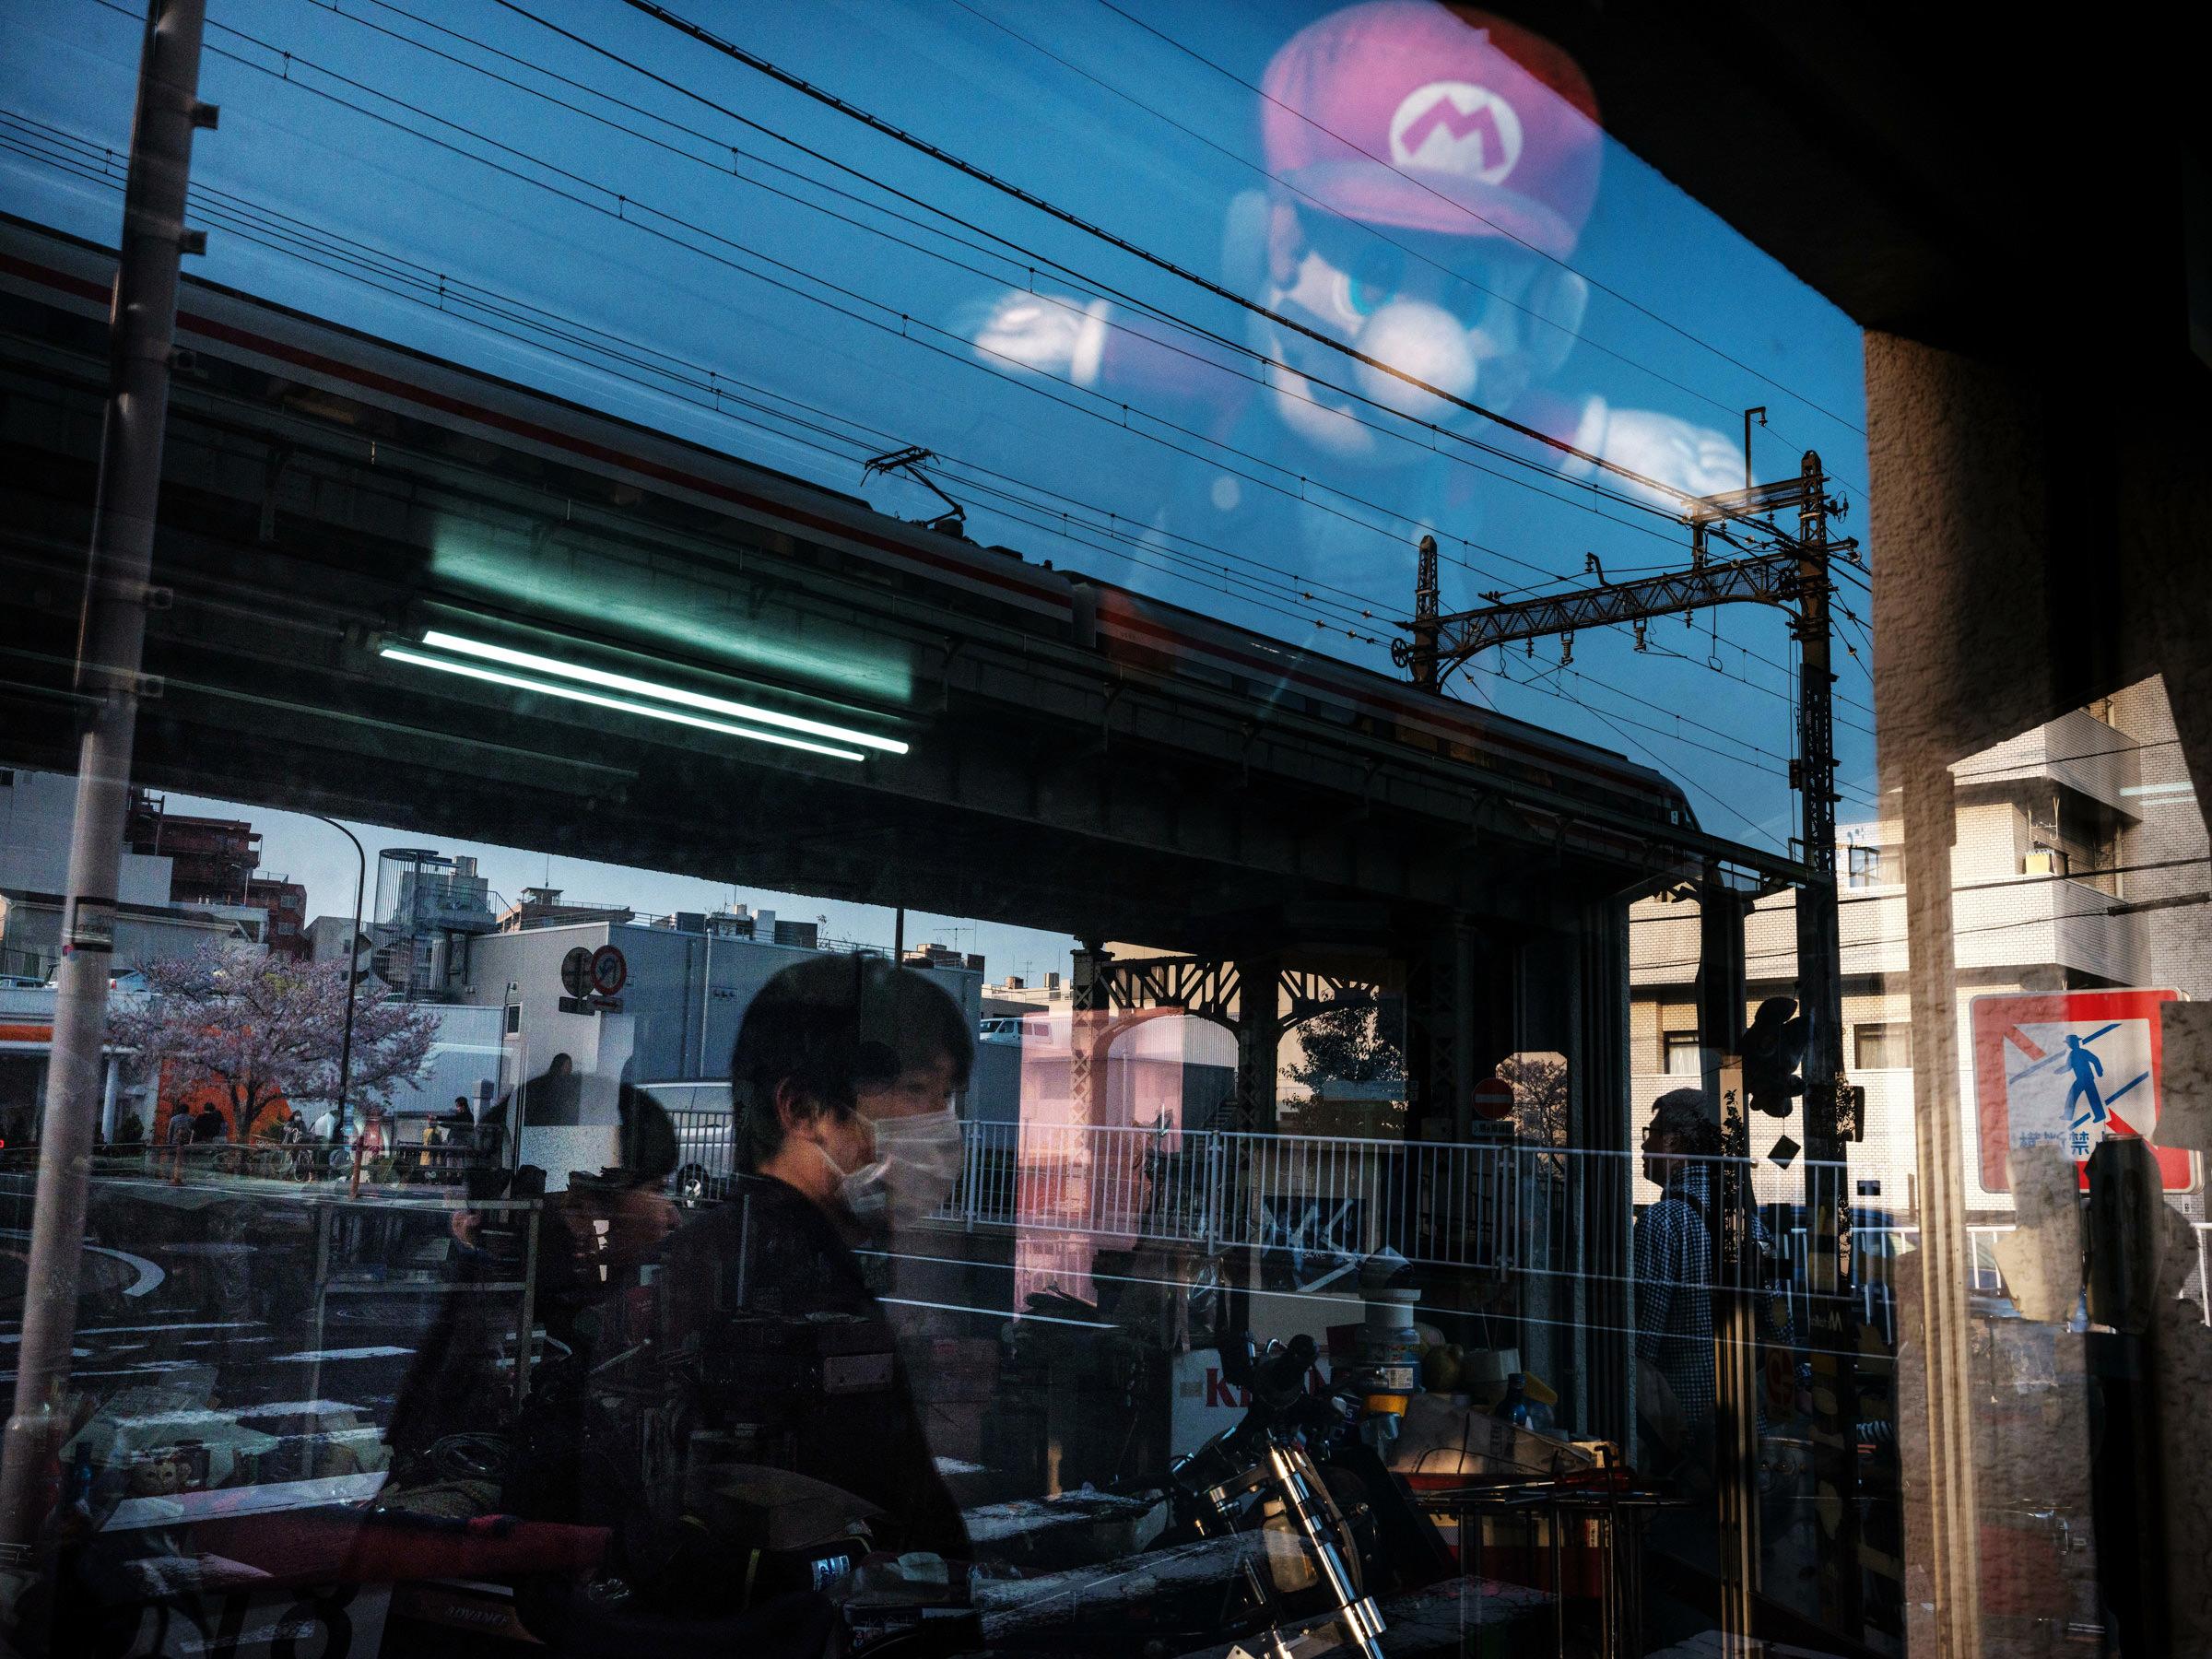 Fujifilm-GFX-Japan-Street-Photography-21